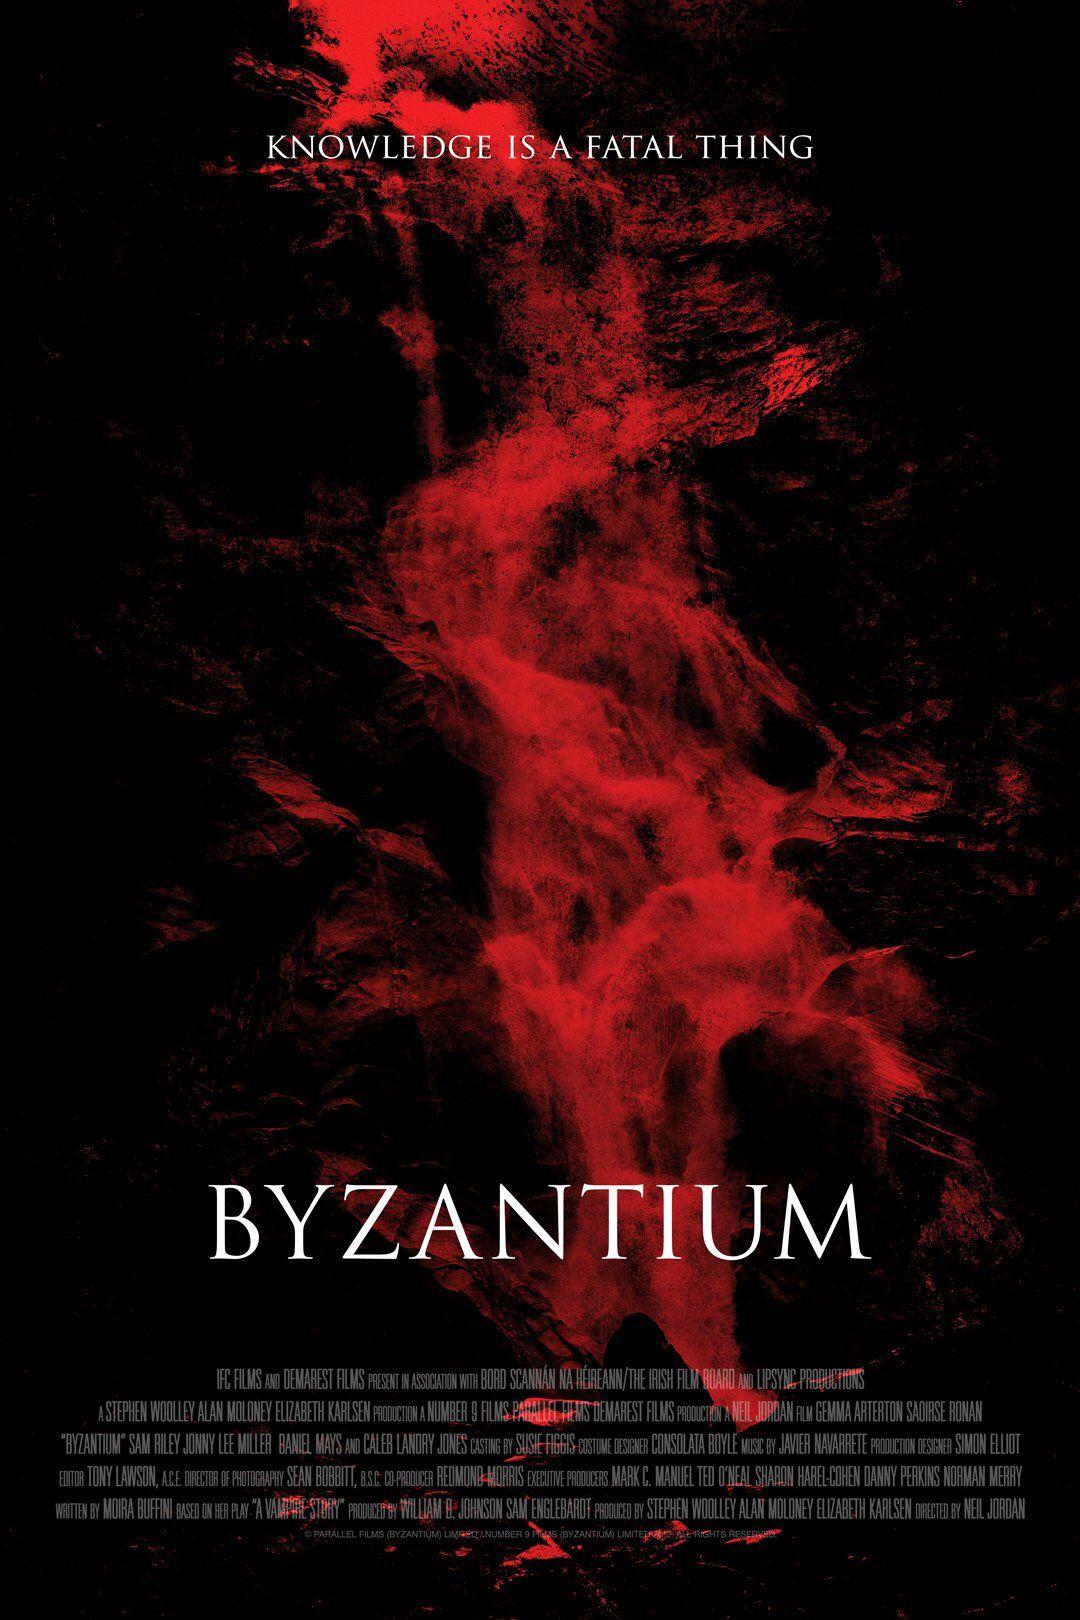 Byzantium (2012) Alternative movie posters, Photo